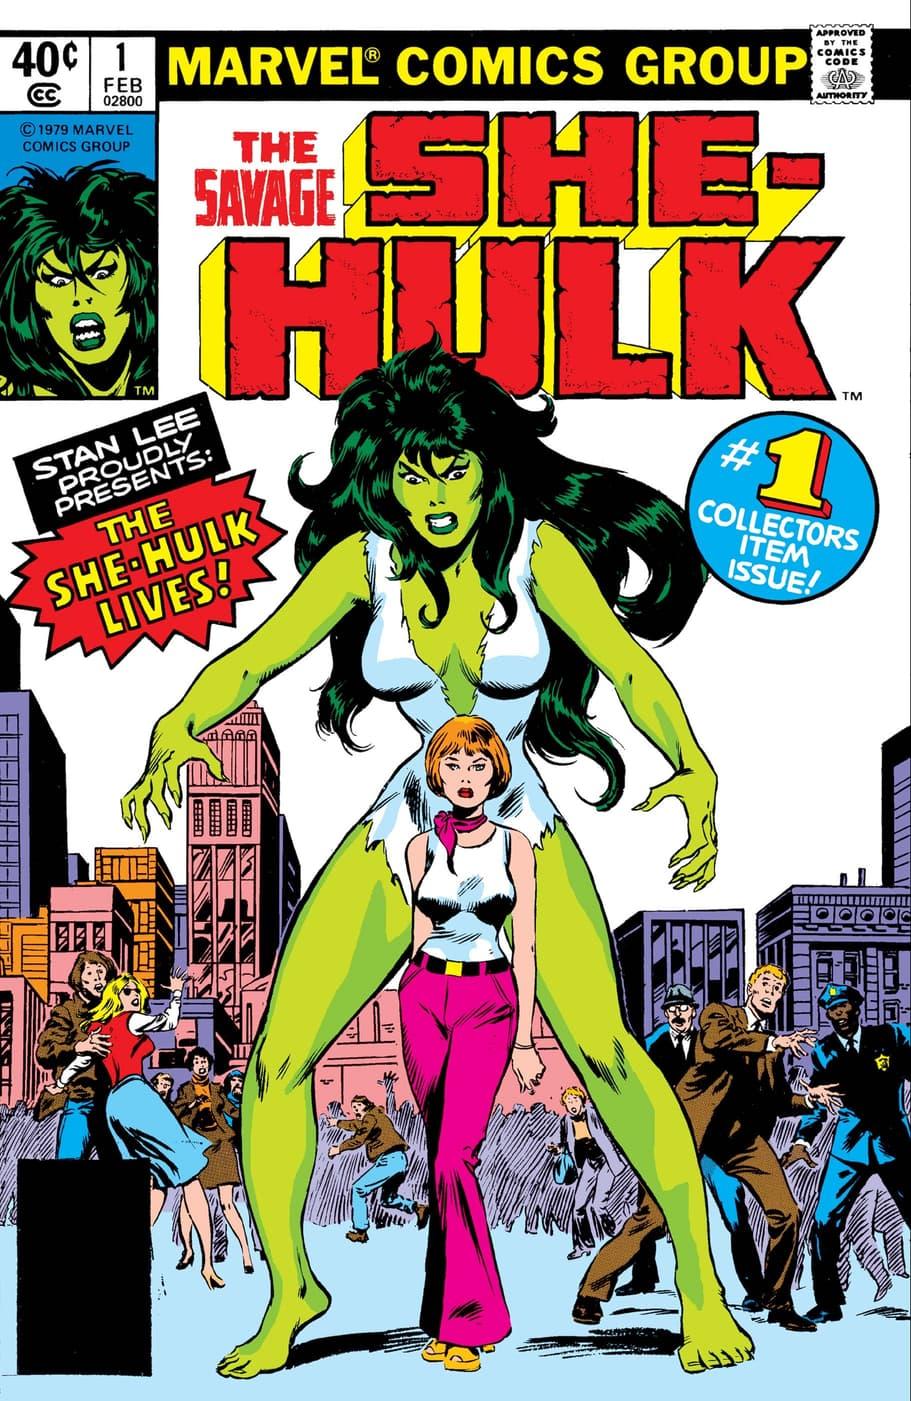 Cover to SAVAGE SHE-HULK (1980) #1